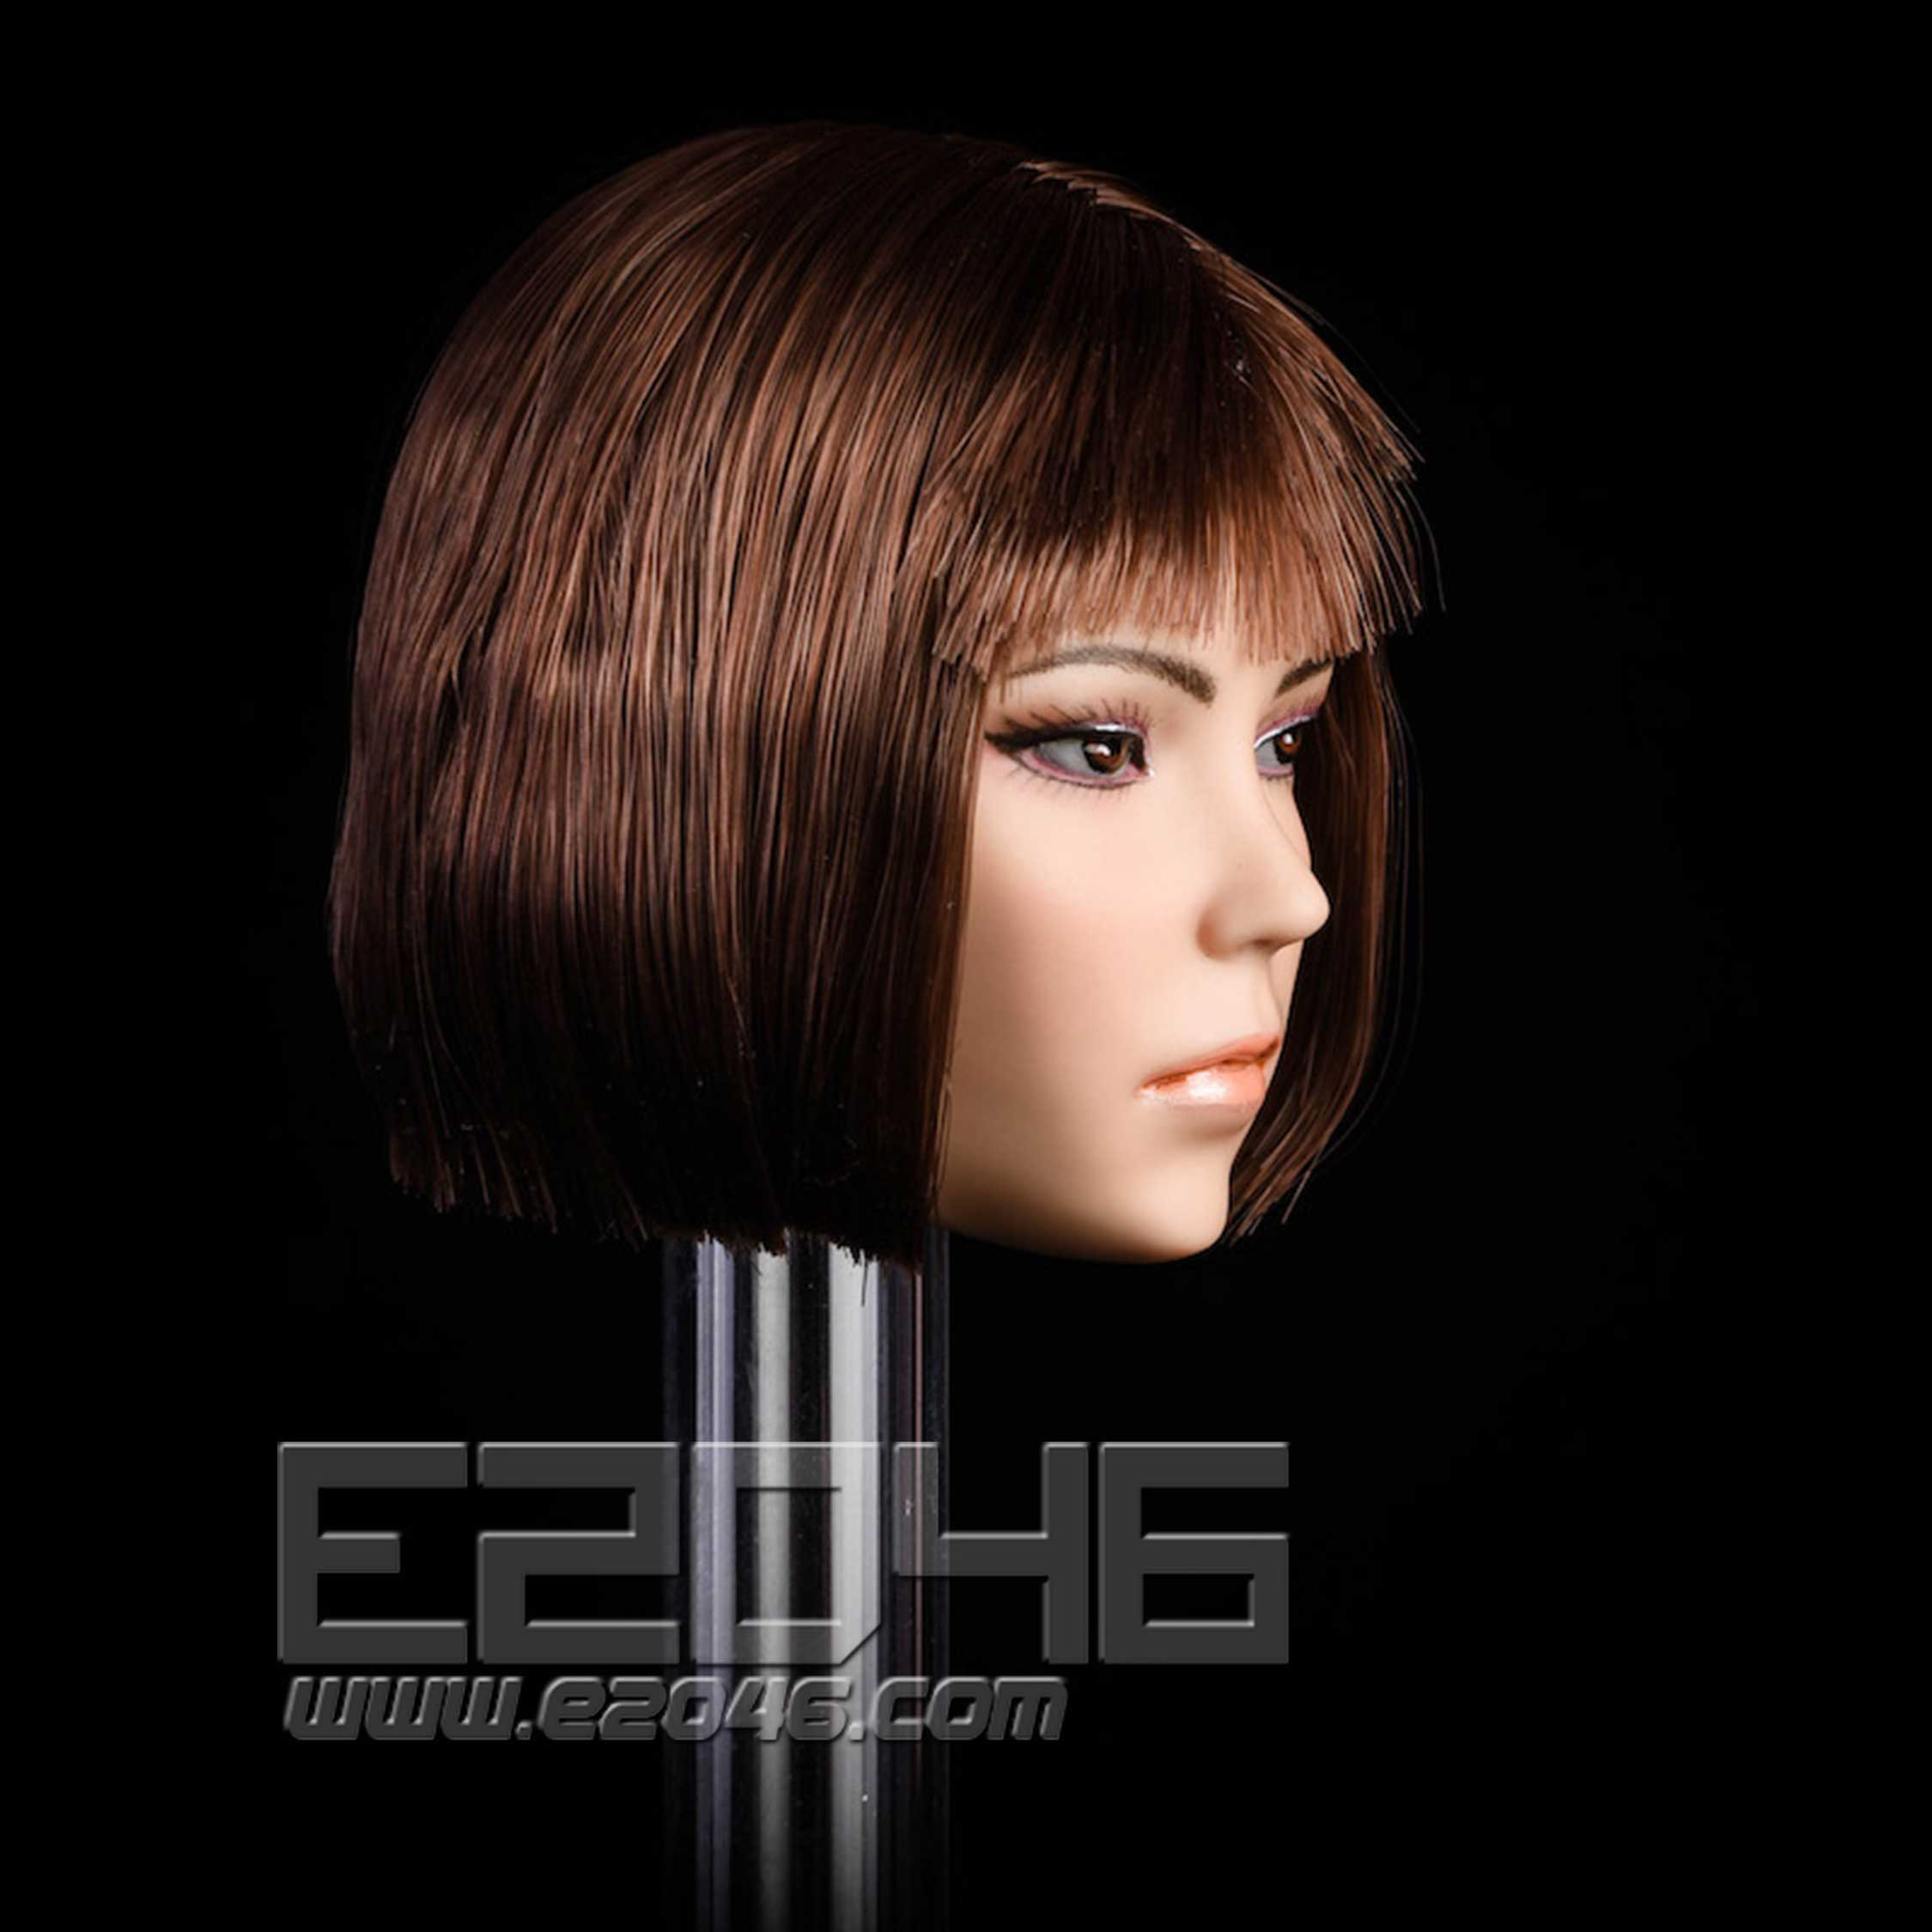 Miscegenation female head A (DOLL)